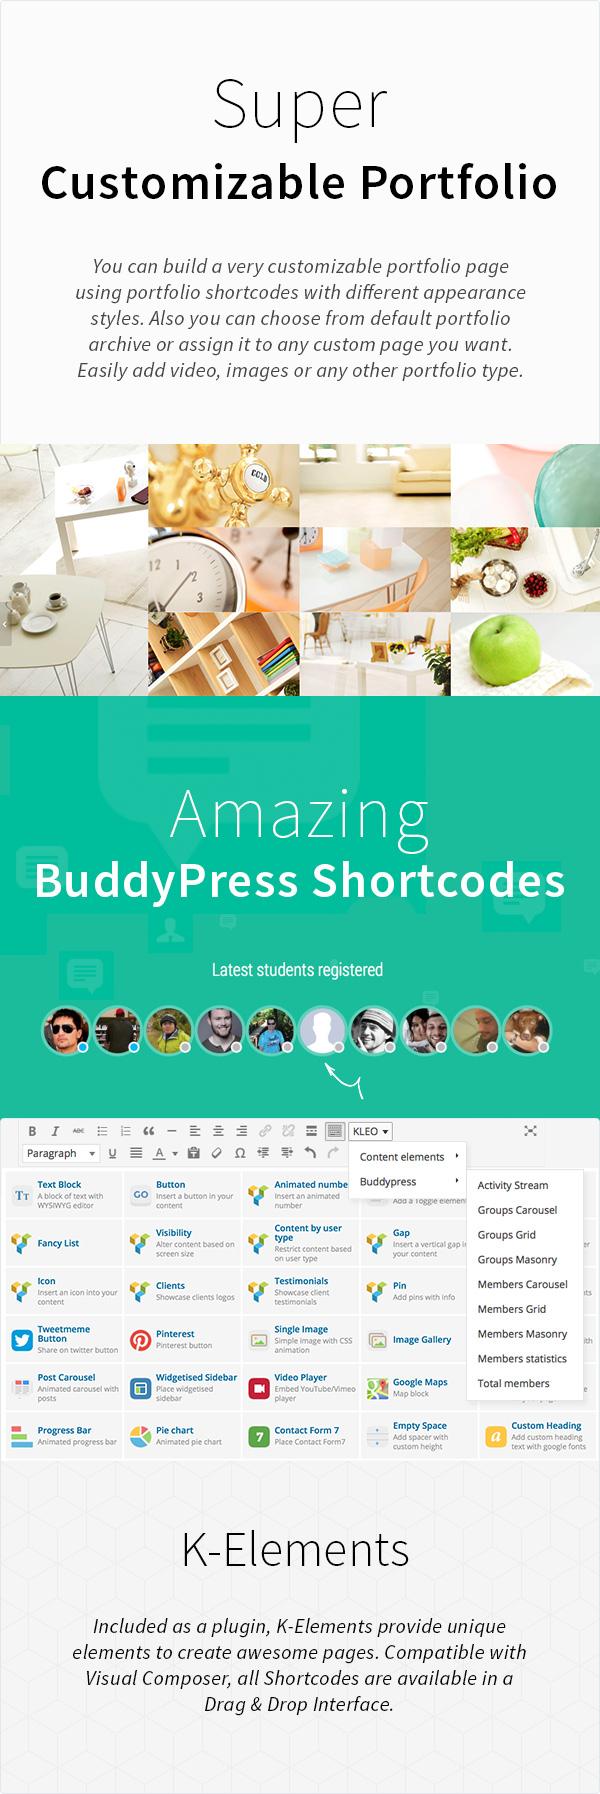 KLEO - Pro Community Focused, Multi-Purpose BuddyPress Theme - 17